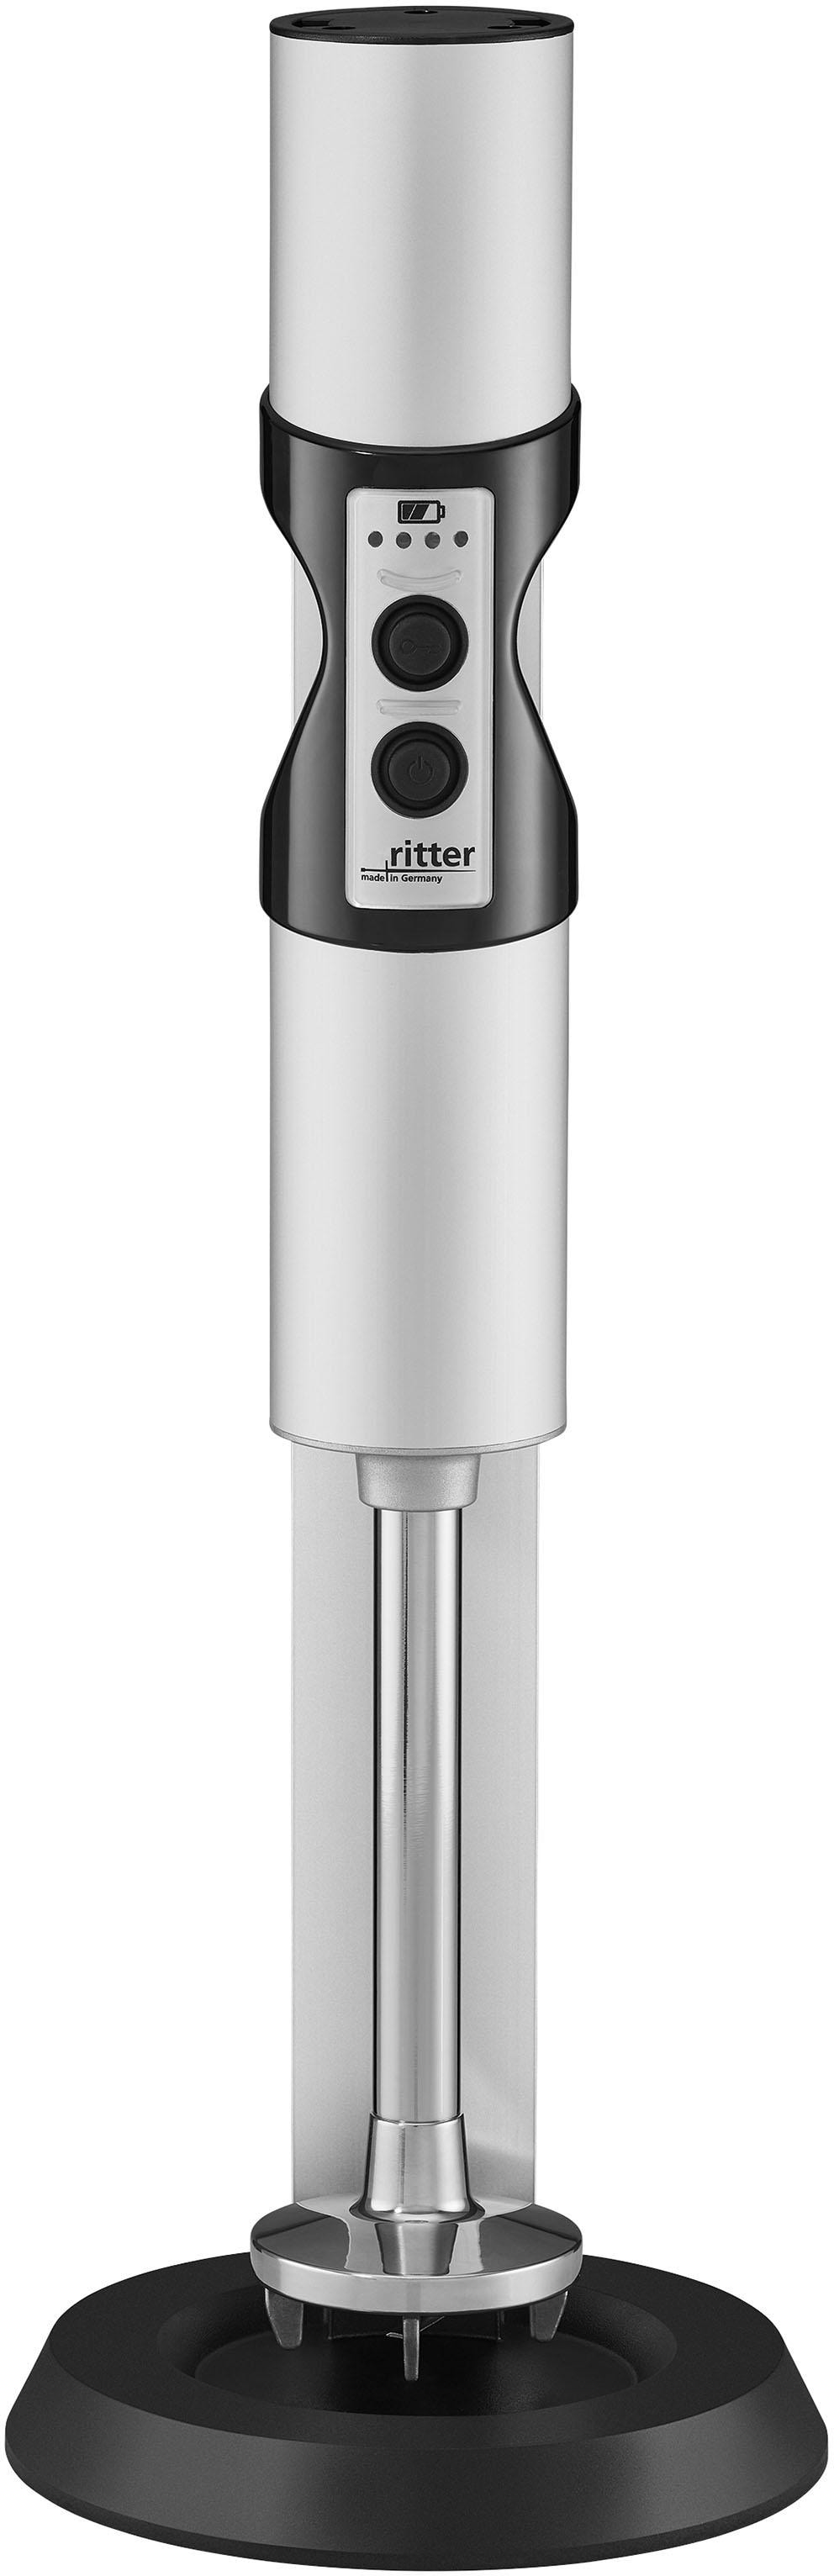 Ritter Stabmixer stilo 7 0 Watt Mixer Zerkleinerer Haushaltsgeräte